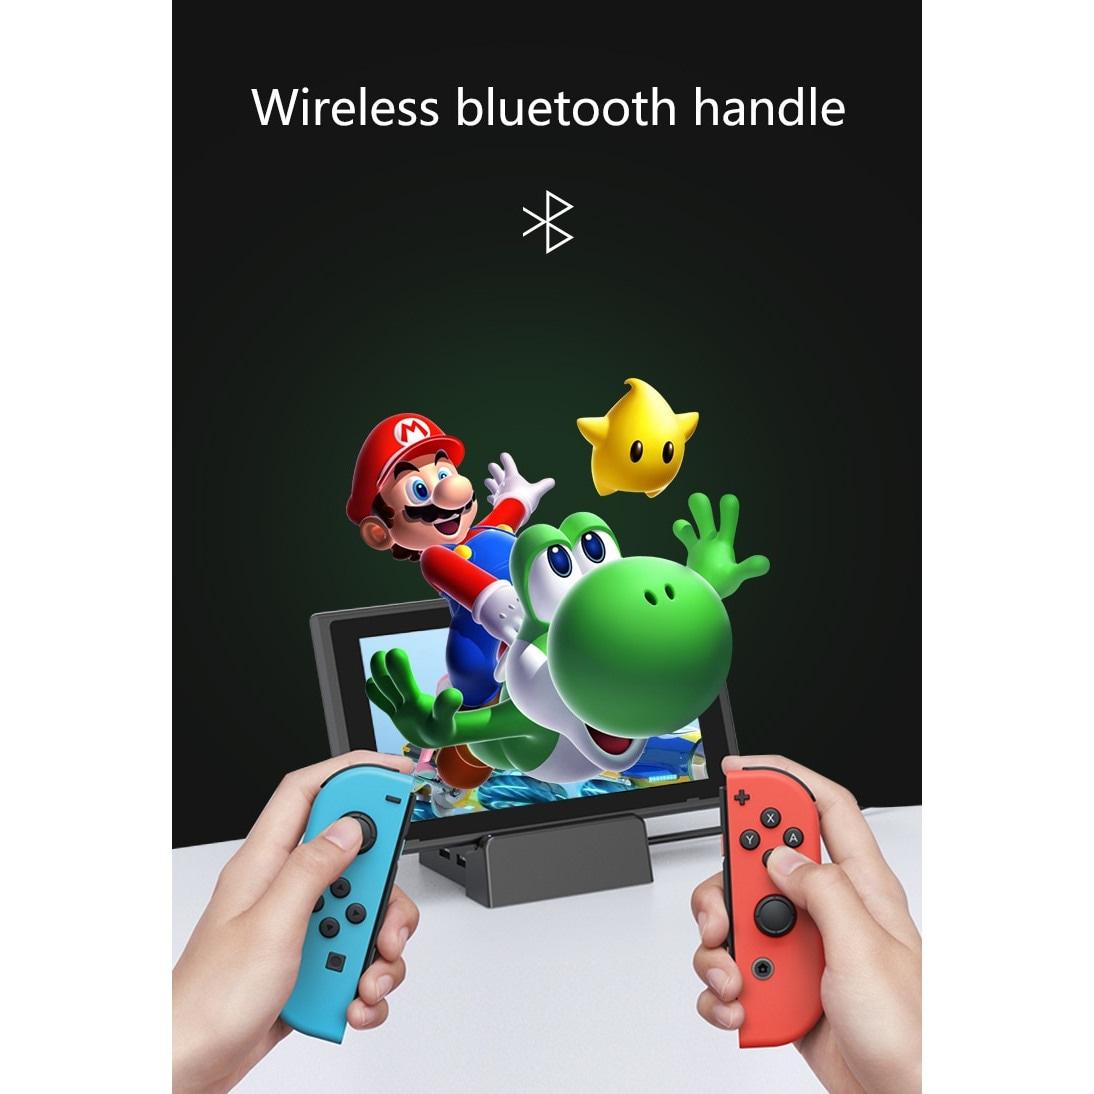 Wireless Joysticks for Nintendo Switch (L and R) Cyan - 5